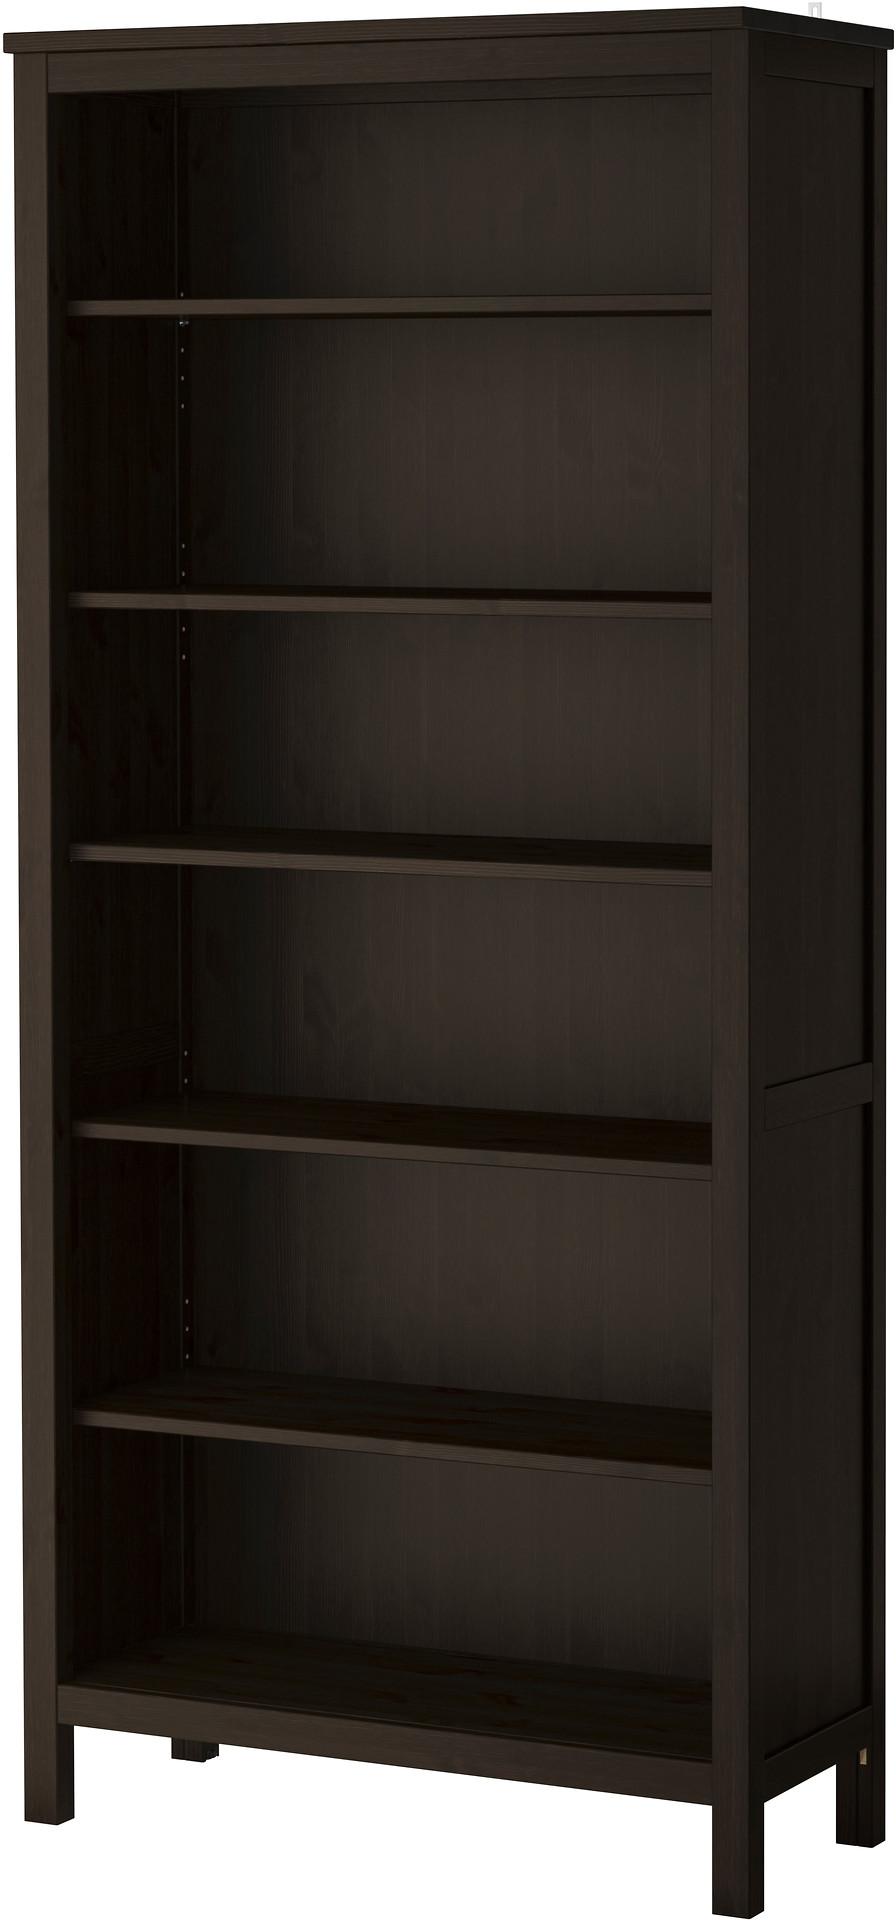 HEMNES Bookcase - black-brown - IKEA